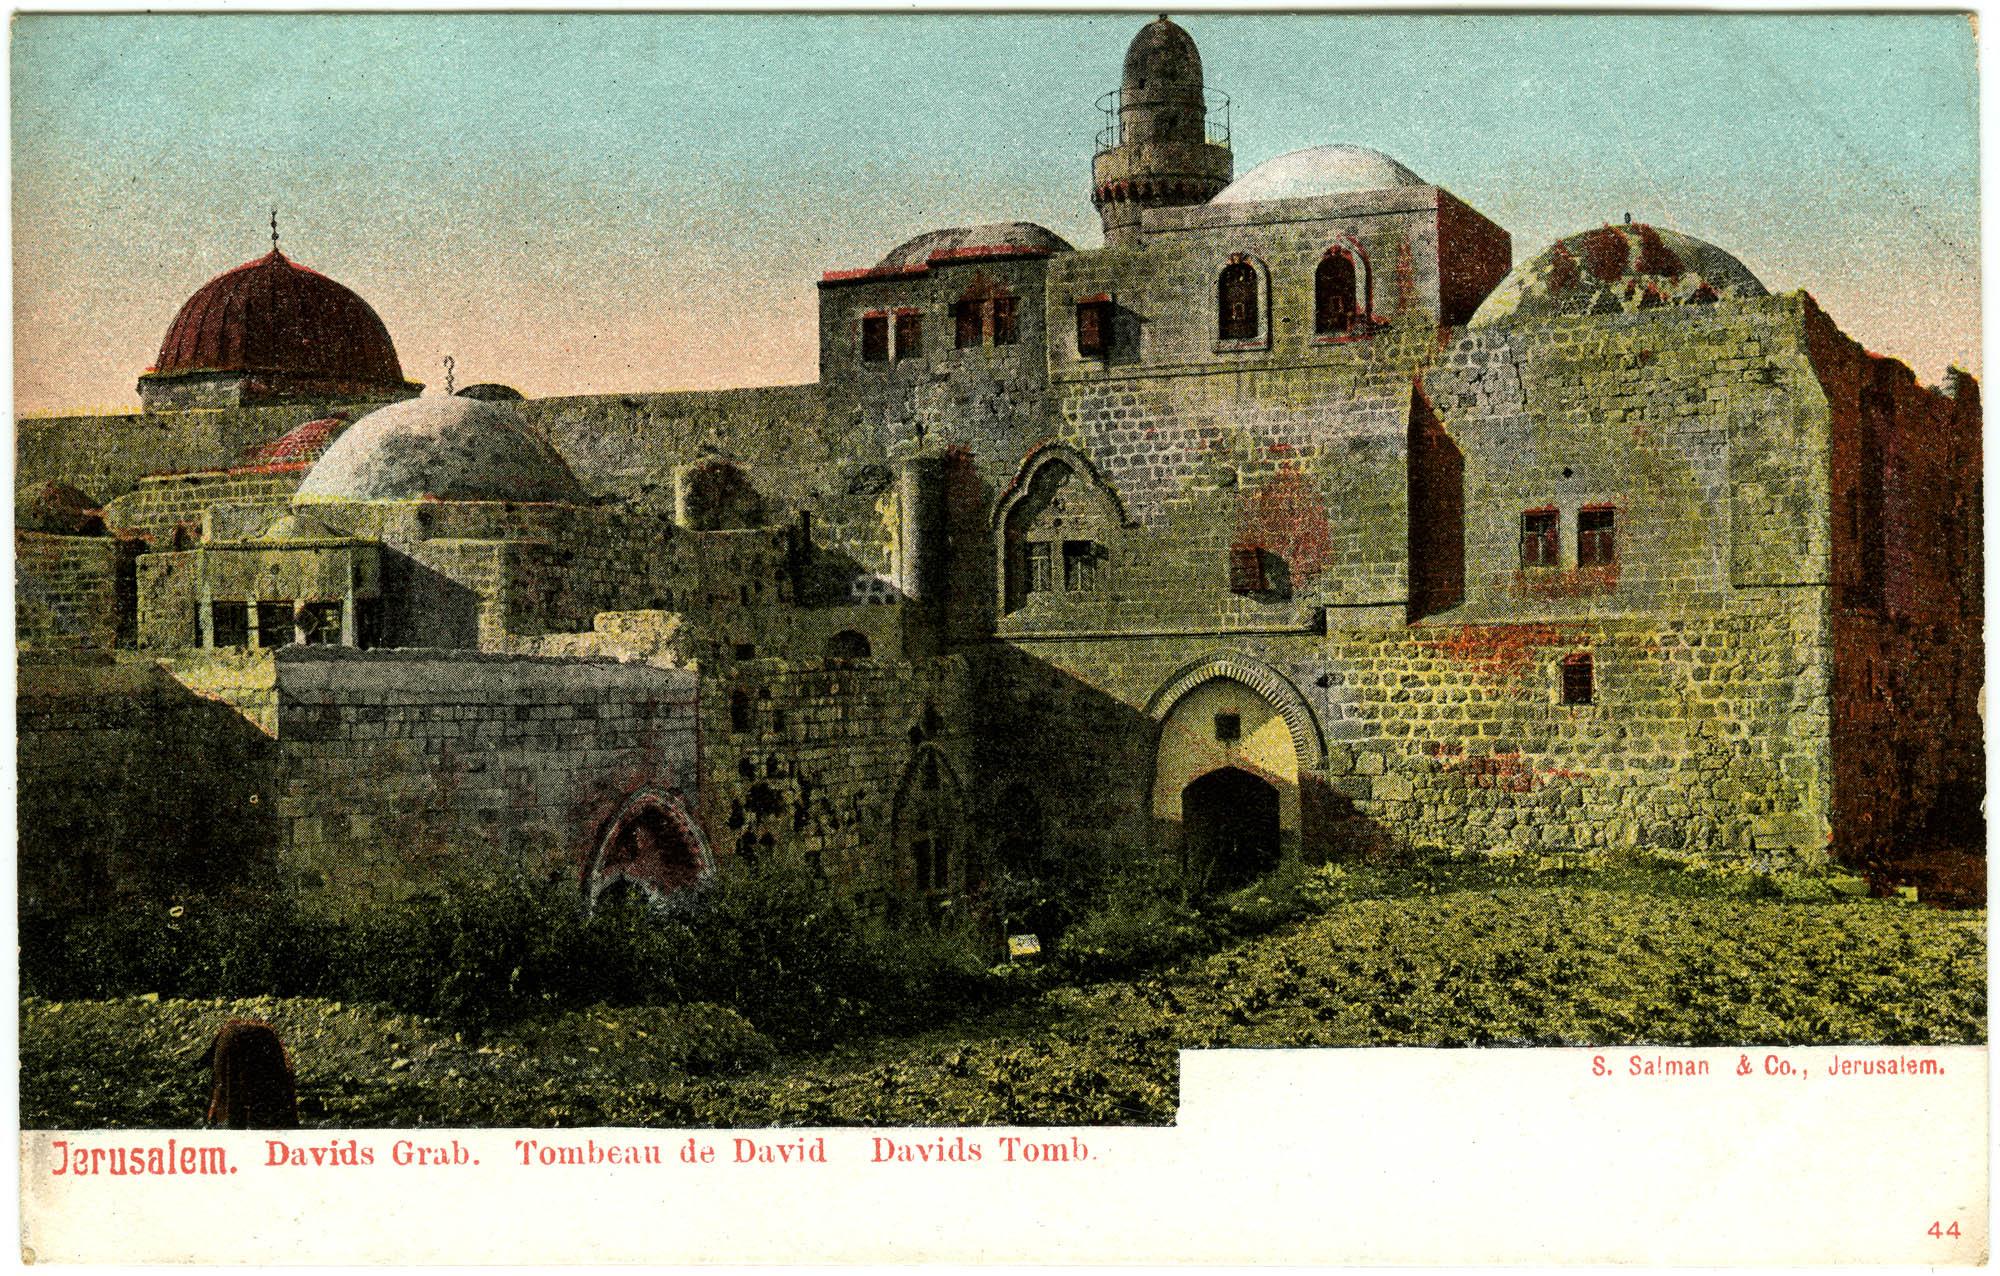 Jerusalem. Davids Grab. / Tombeau de David. / David's Tomb.